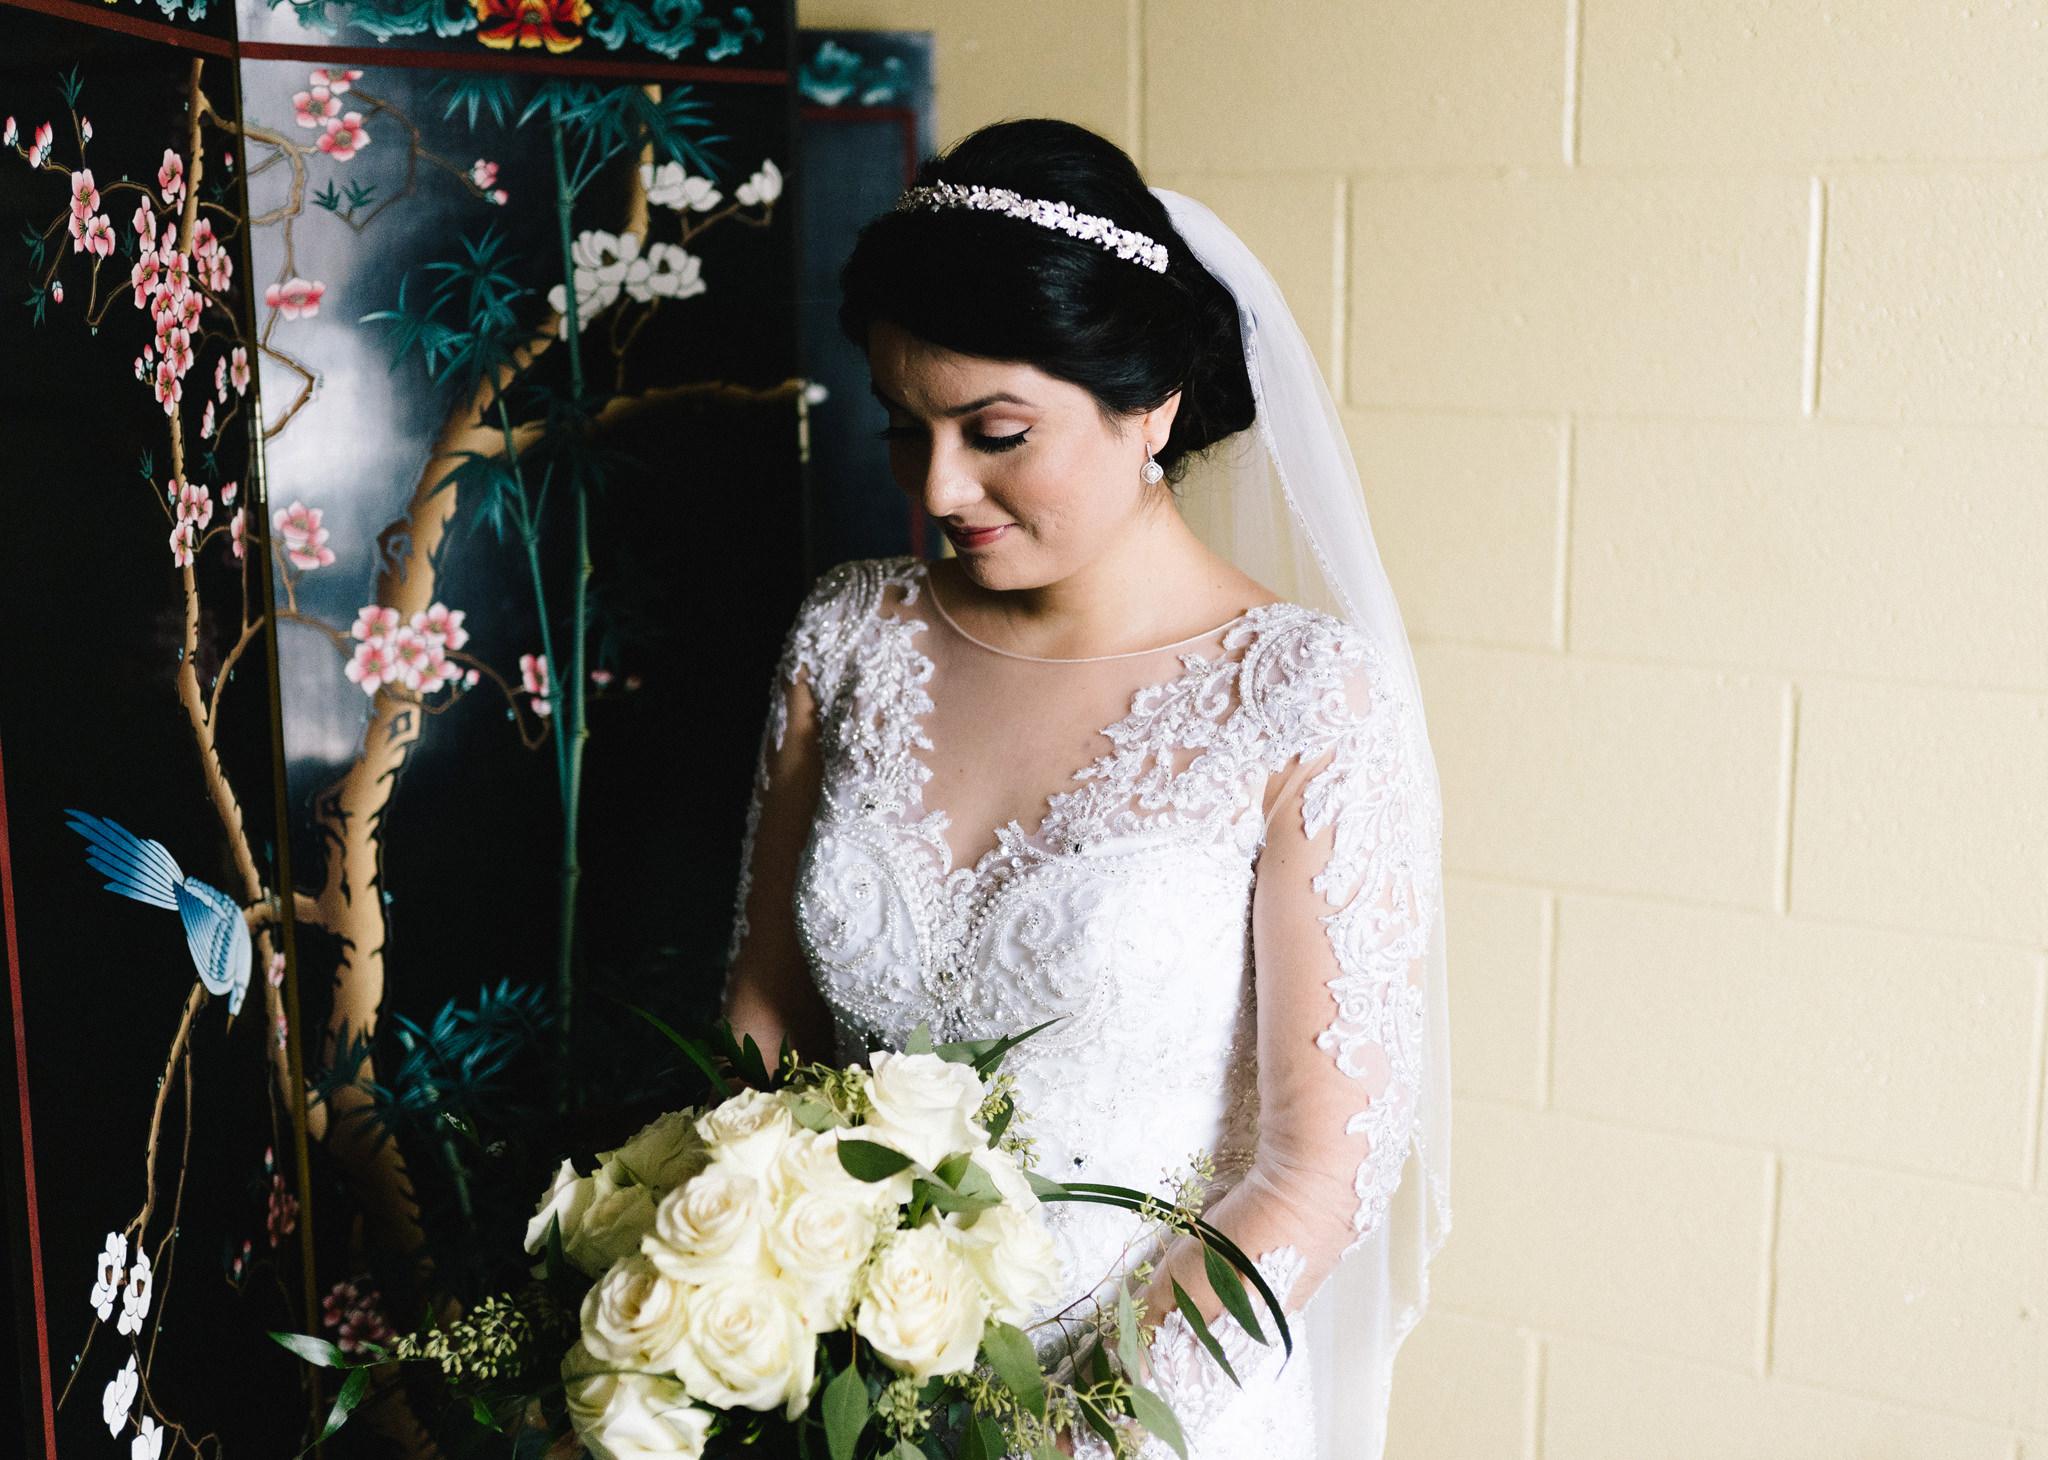 004-rempel-photography-chicago-wedding-inspiration-susan-daniel-michigan-metro-detroit-christian-church-holly-vault-cupcakes-and-kisses.jpg